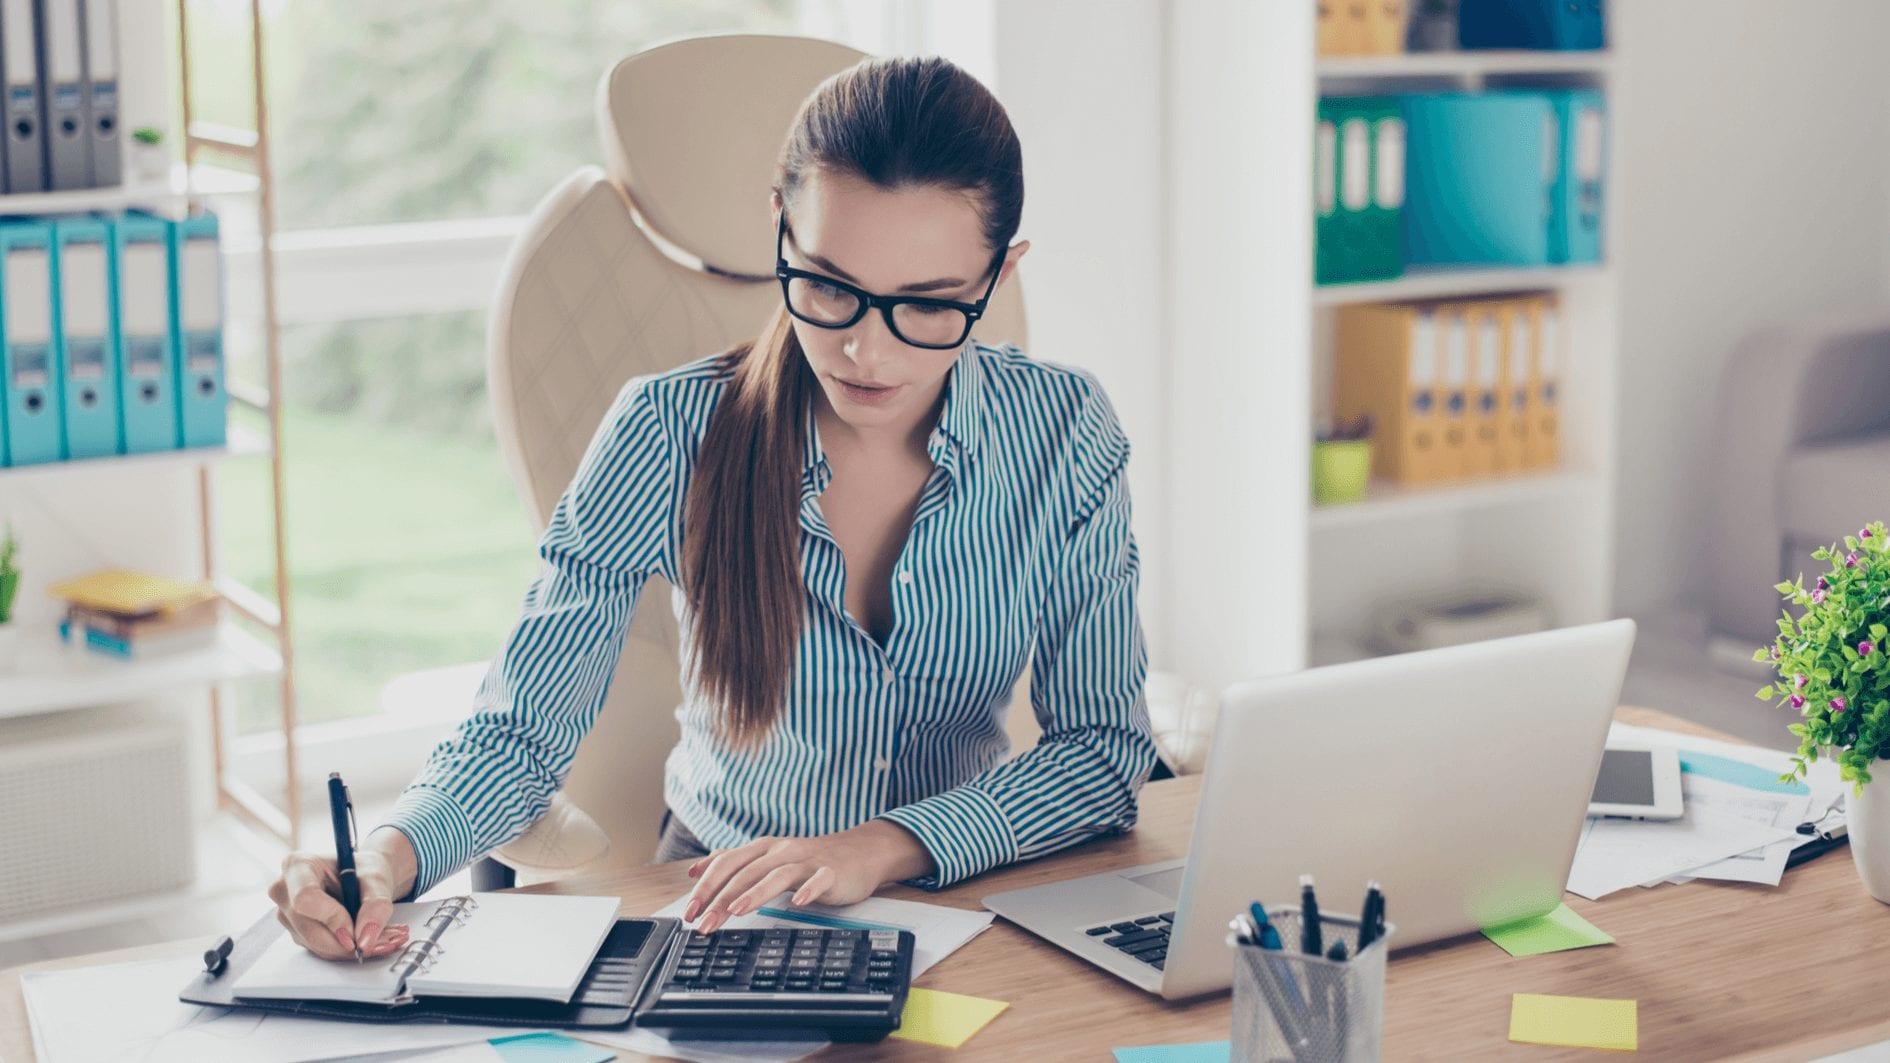 Seputar Aplikasi Penggajian Karyawan yang Perlu Anda Ketahui